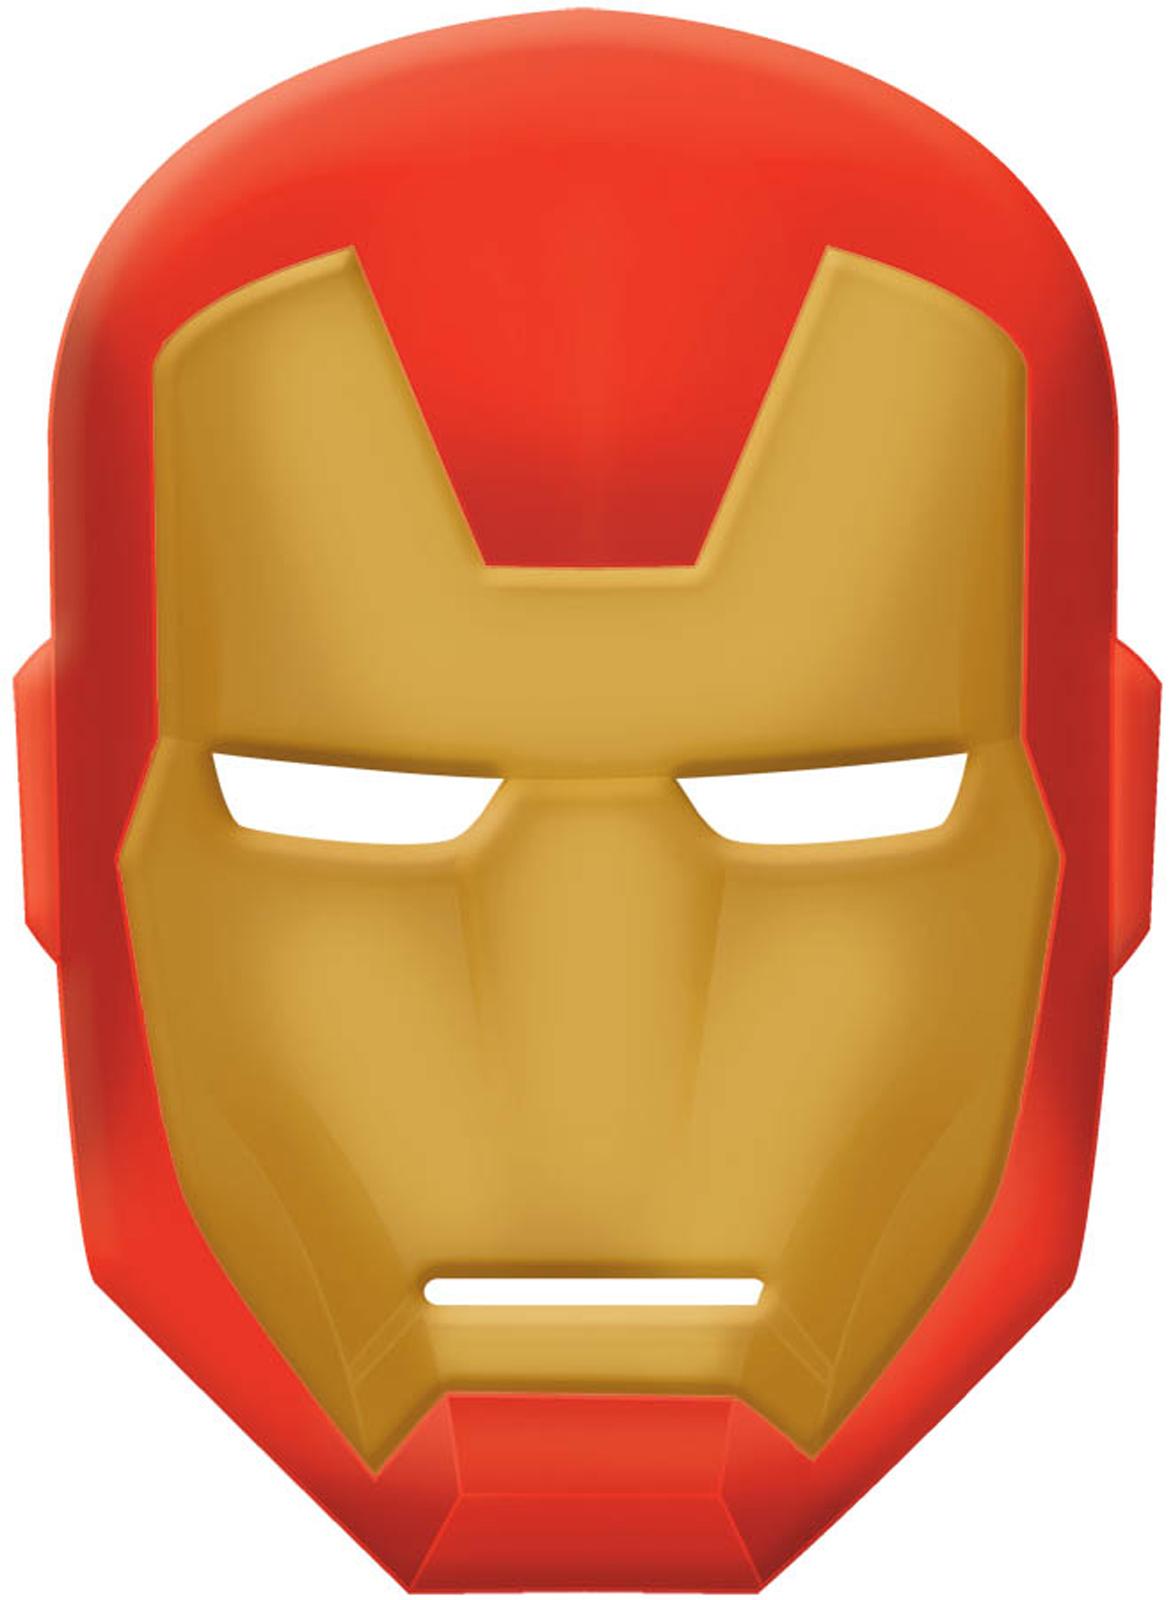 Avengers Assemble Iron Man Mask | BuyCostumes.com